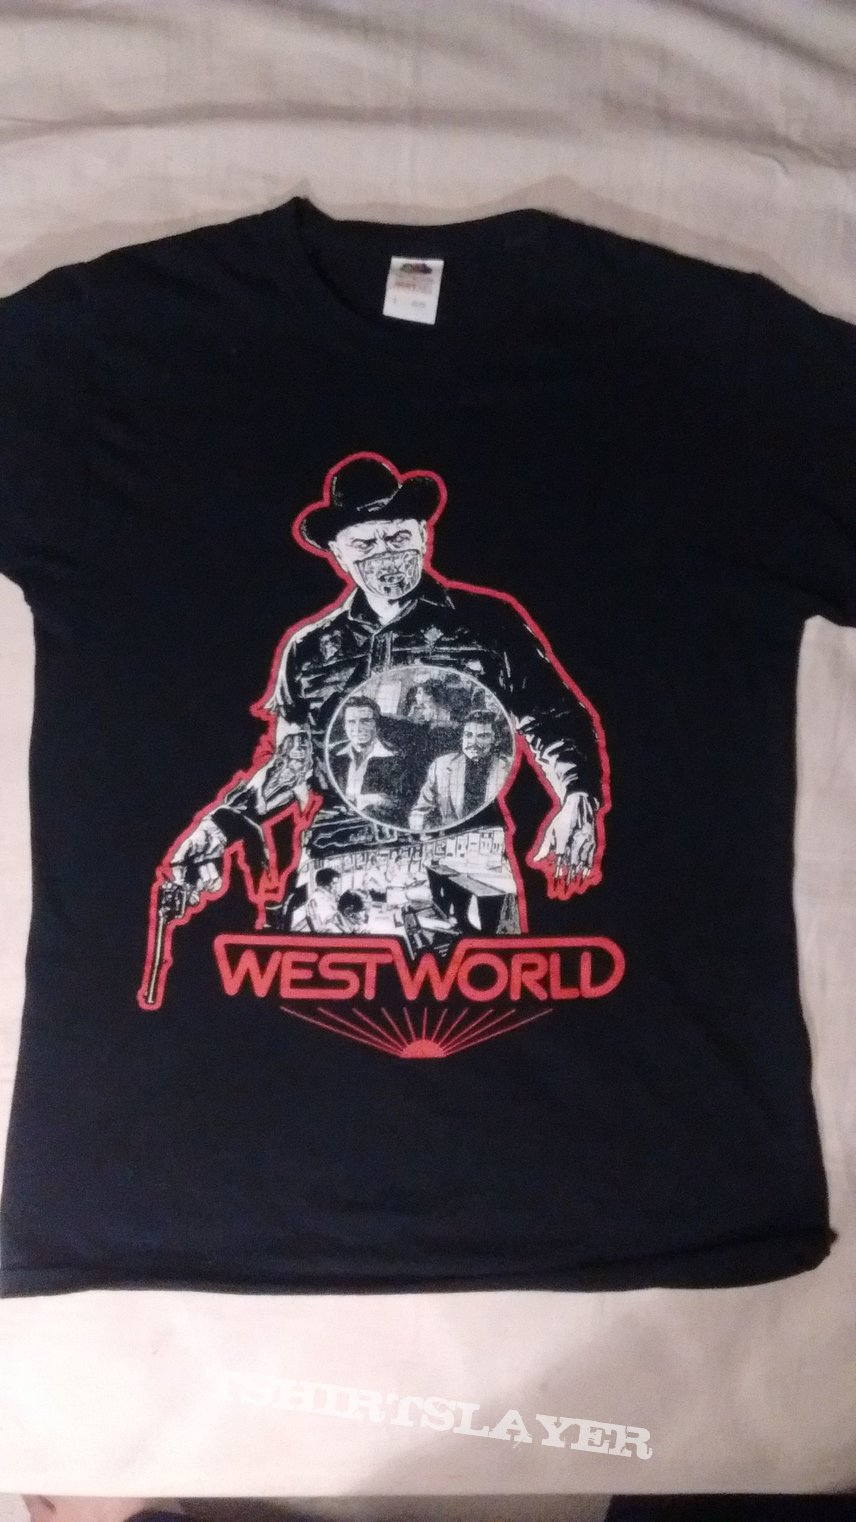 Westworld Shirt,